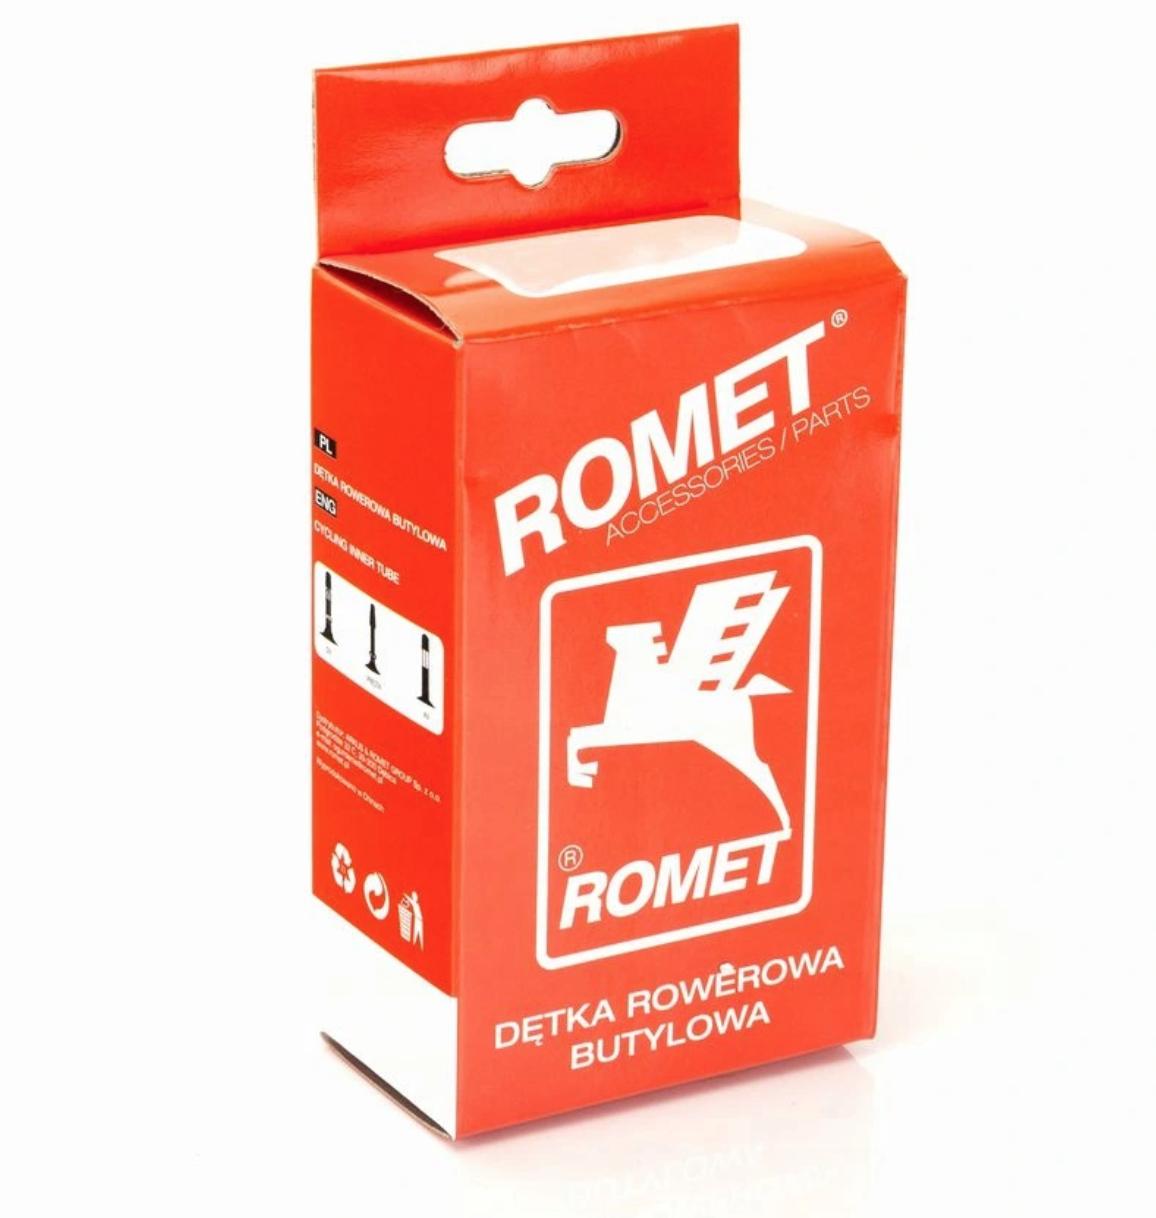 Камера для велосипеда Romet 28 x 1 3/8 x 1 5/8 AV L-48